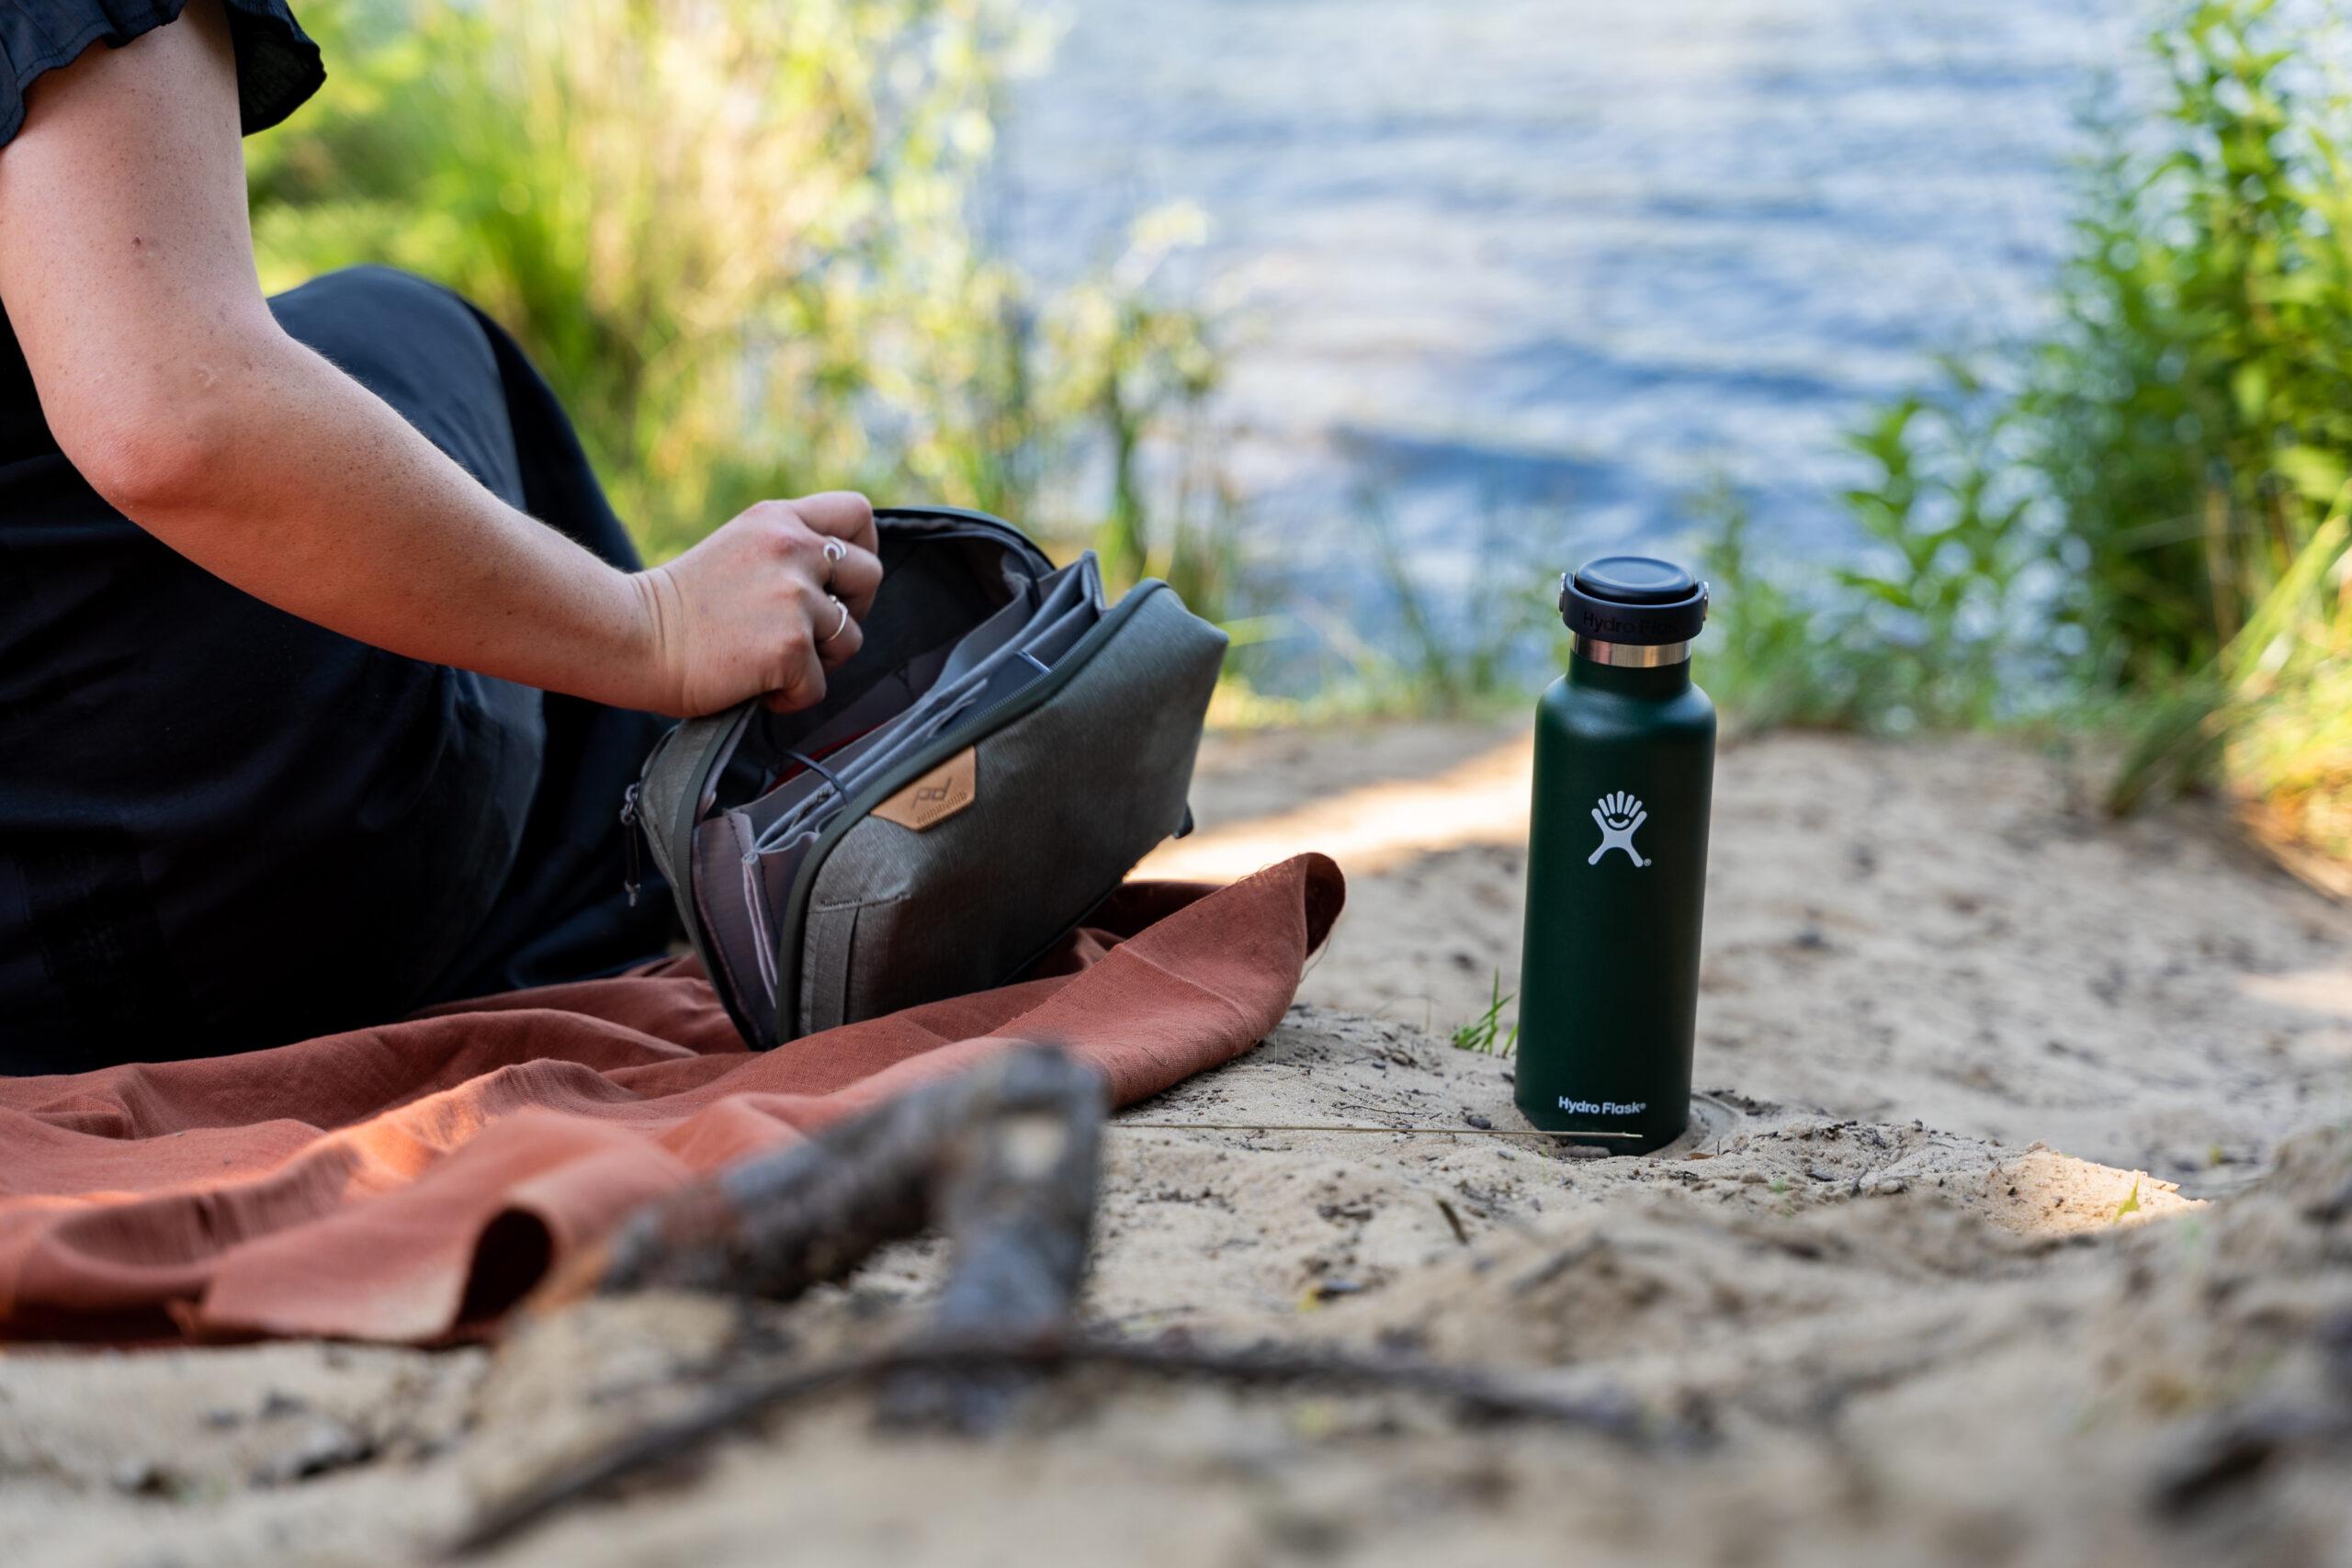 Hydro Flask - TravelRebel - Mei Plastic vrij